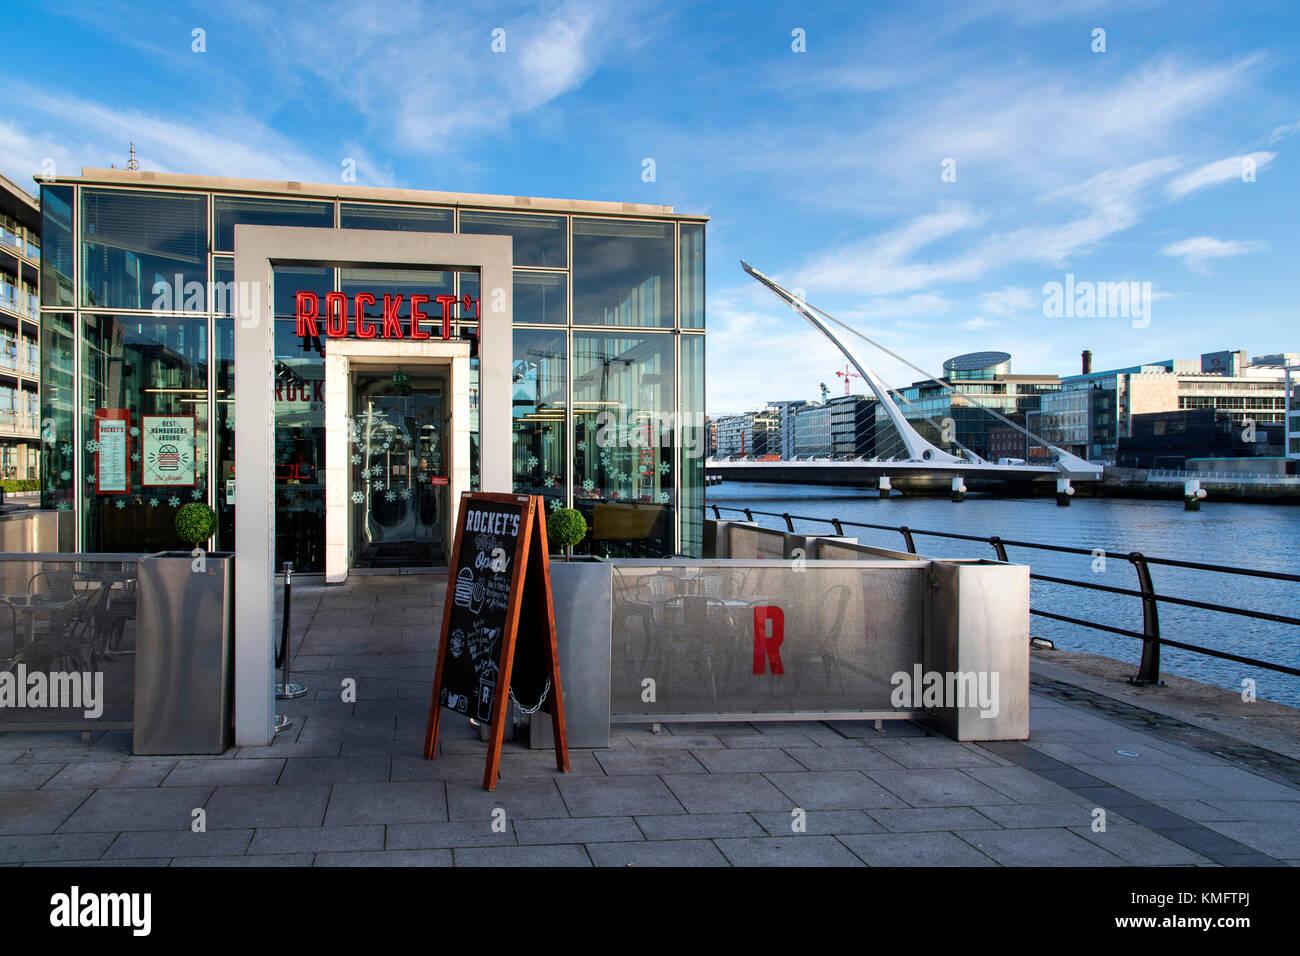 View towards Dublin Docklands, Ireland - Stock Image